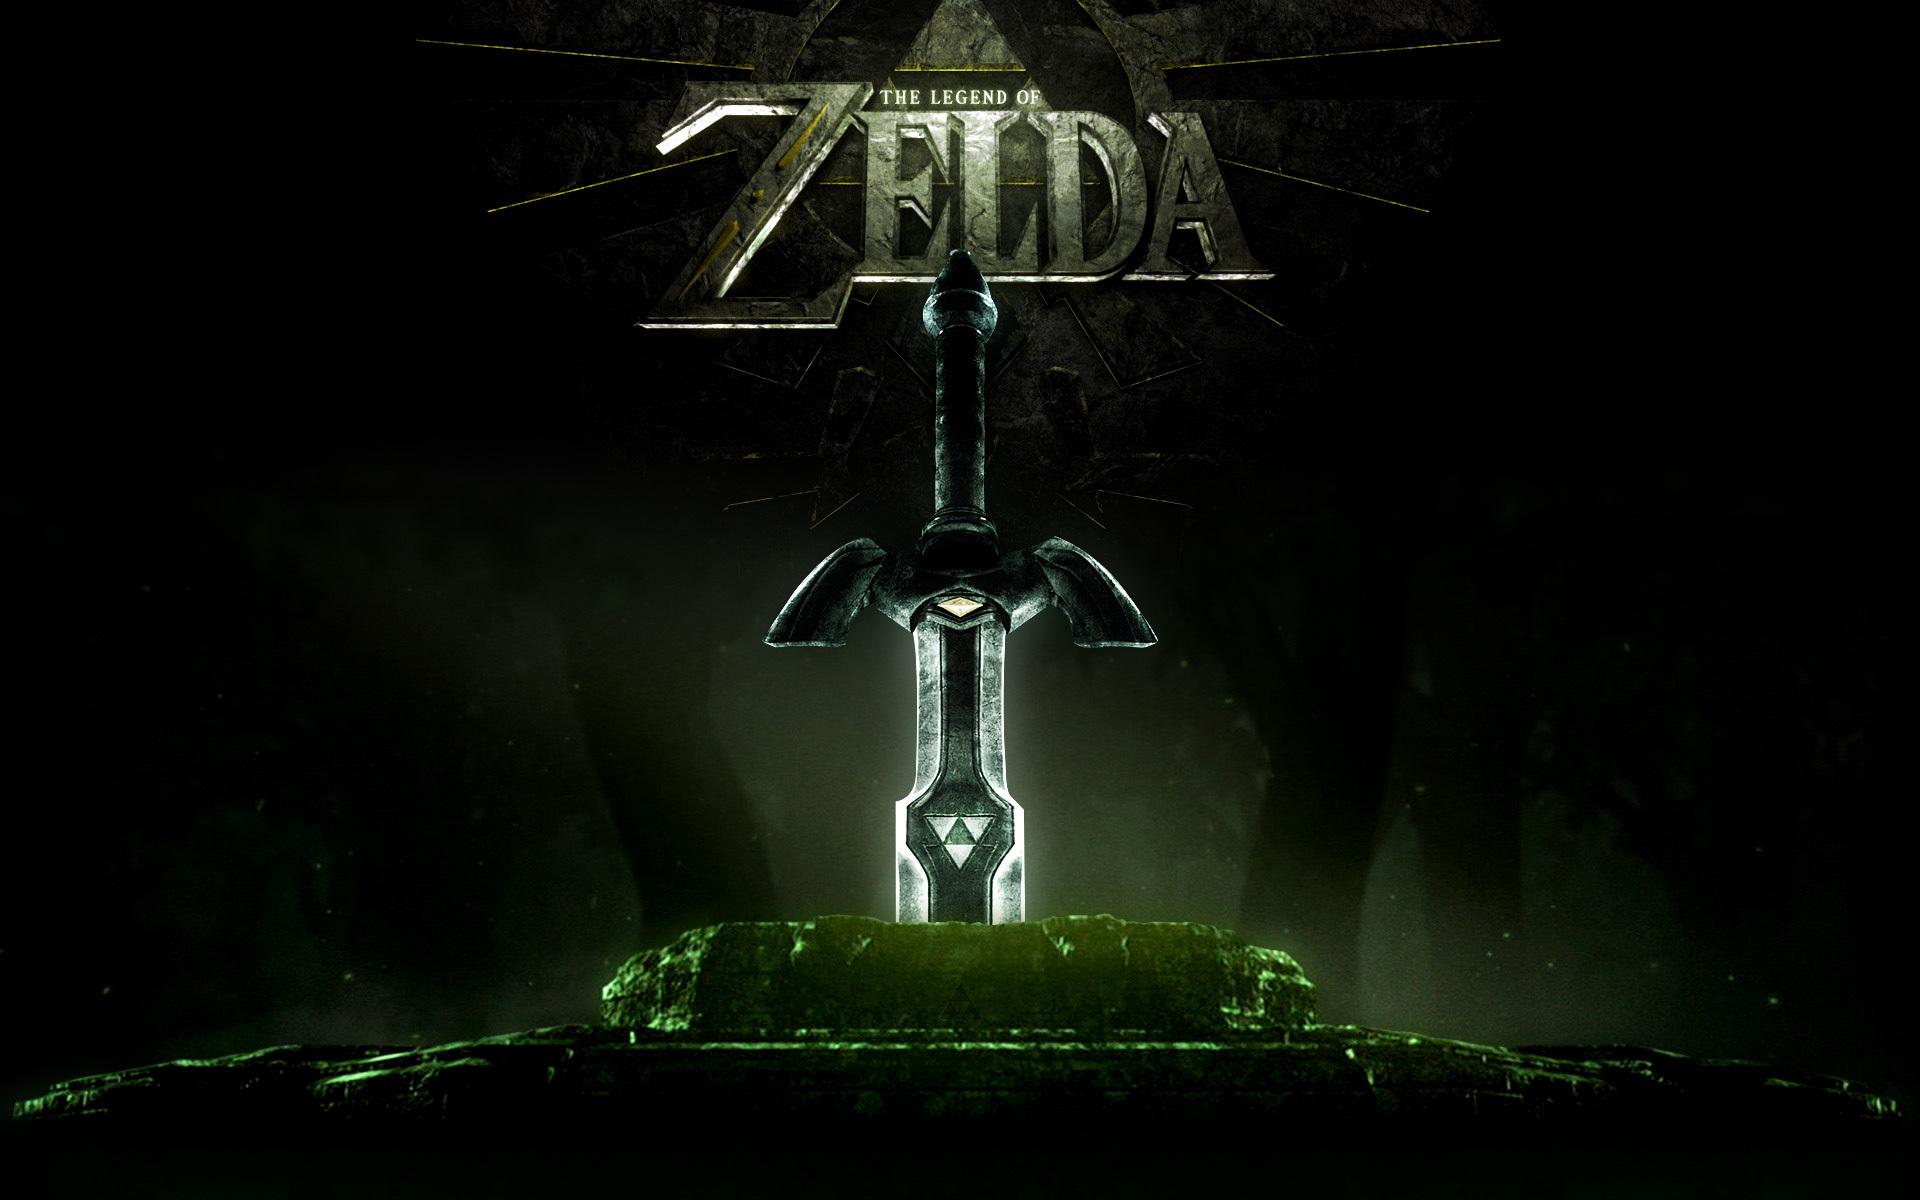 Zeldas Master Sword Wallpaper   Mitchelaneous 1920x1200